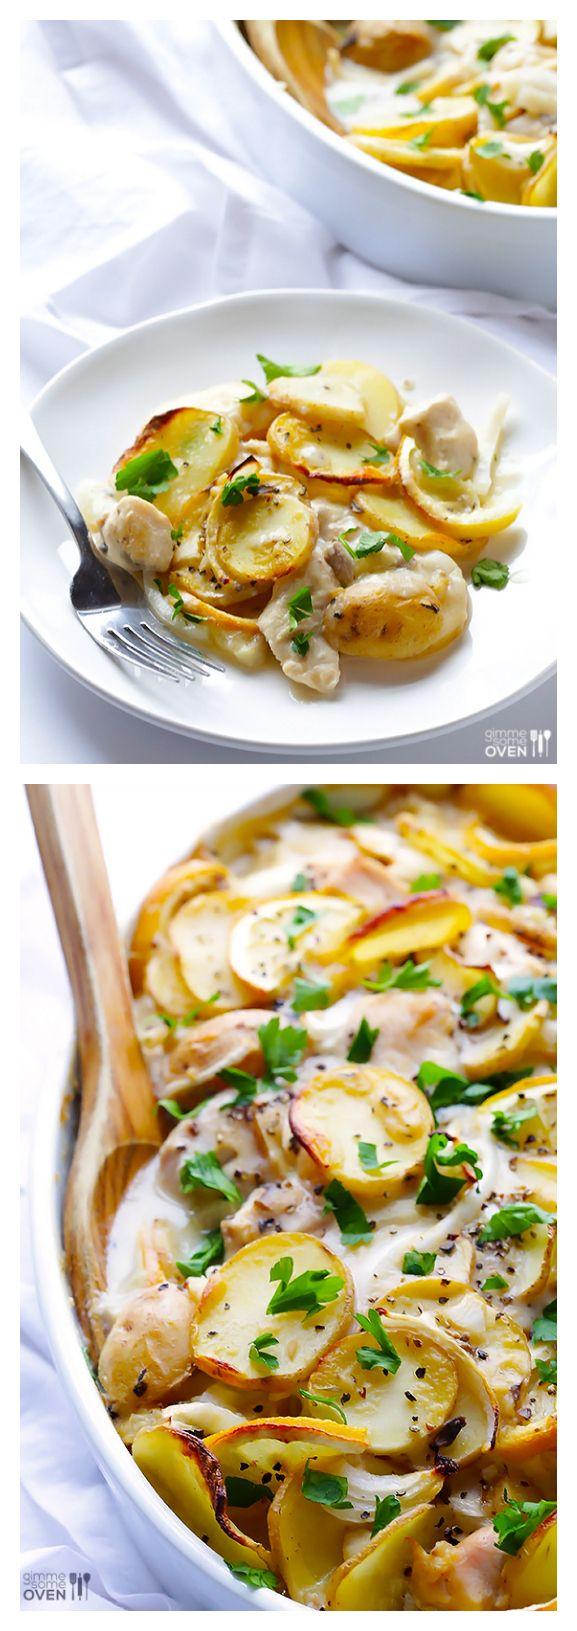 Easy Lemon Chicken Potato Casserole -- one of our family's favorite recipes! gimmesomeoven.com #recipe